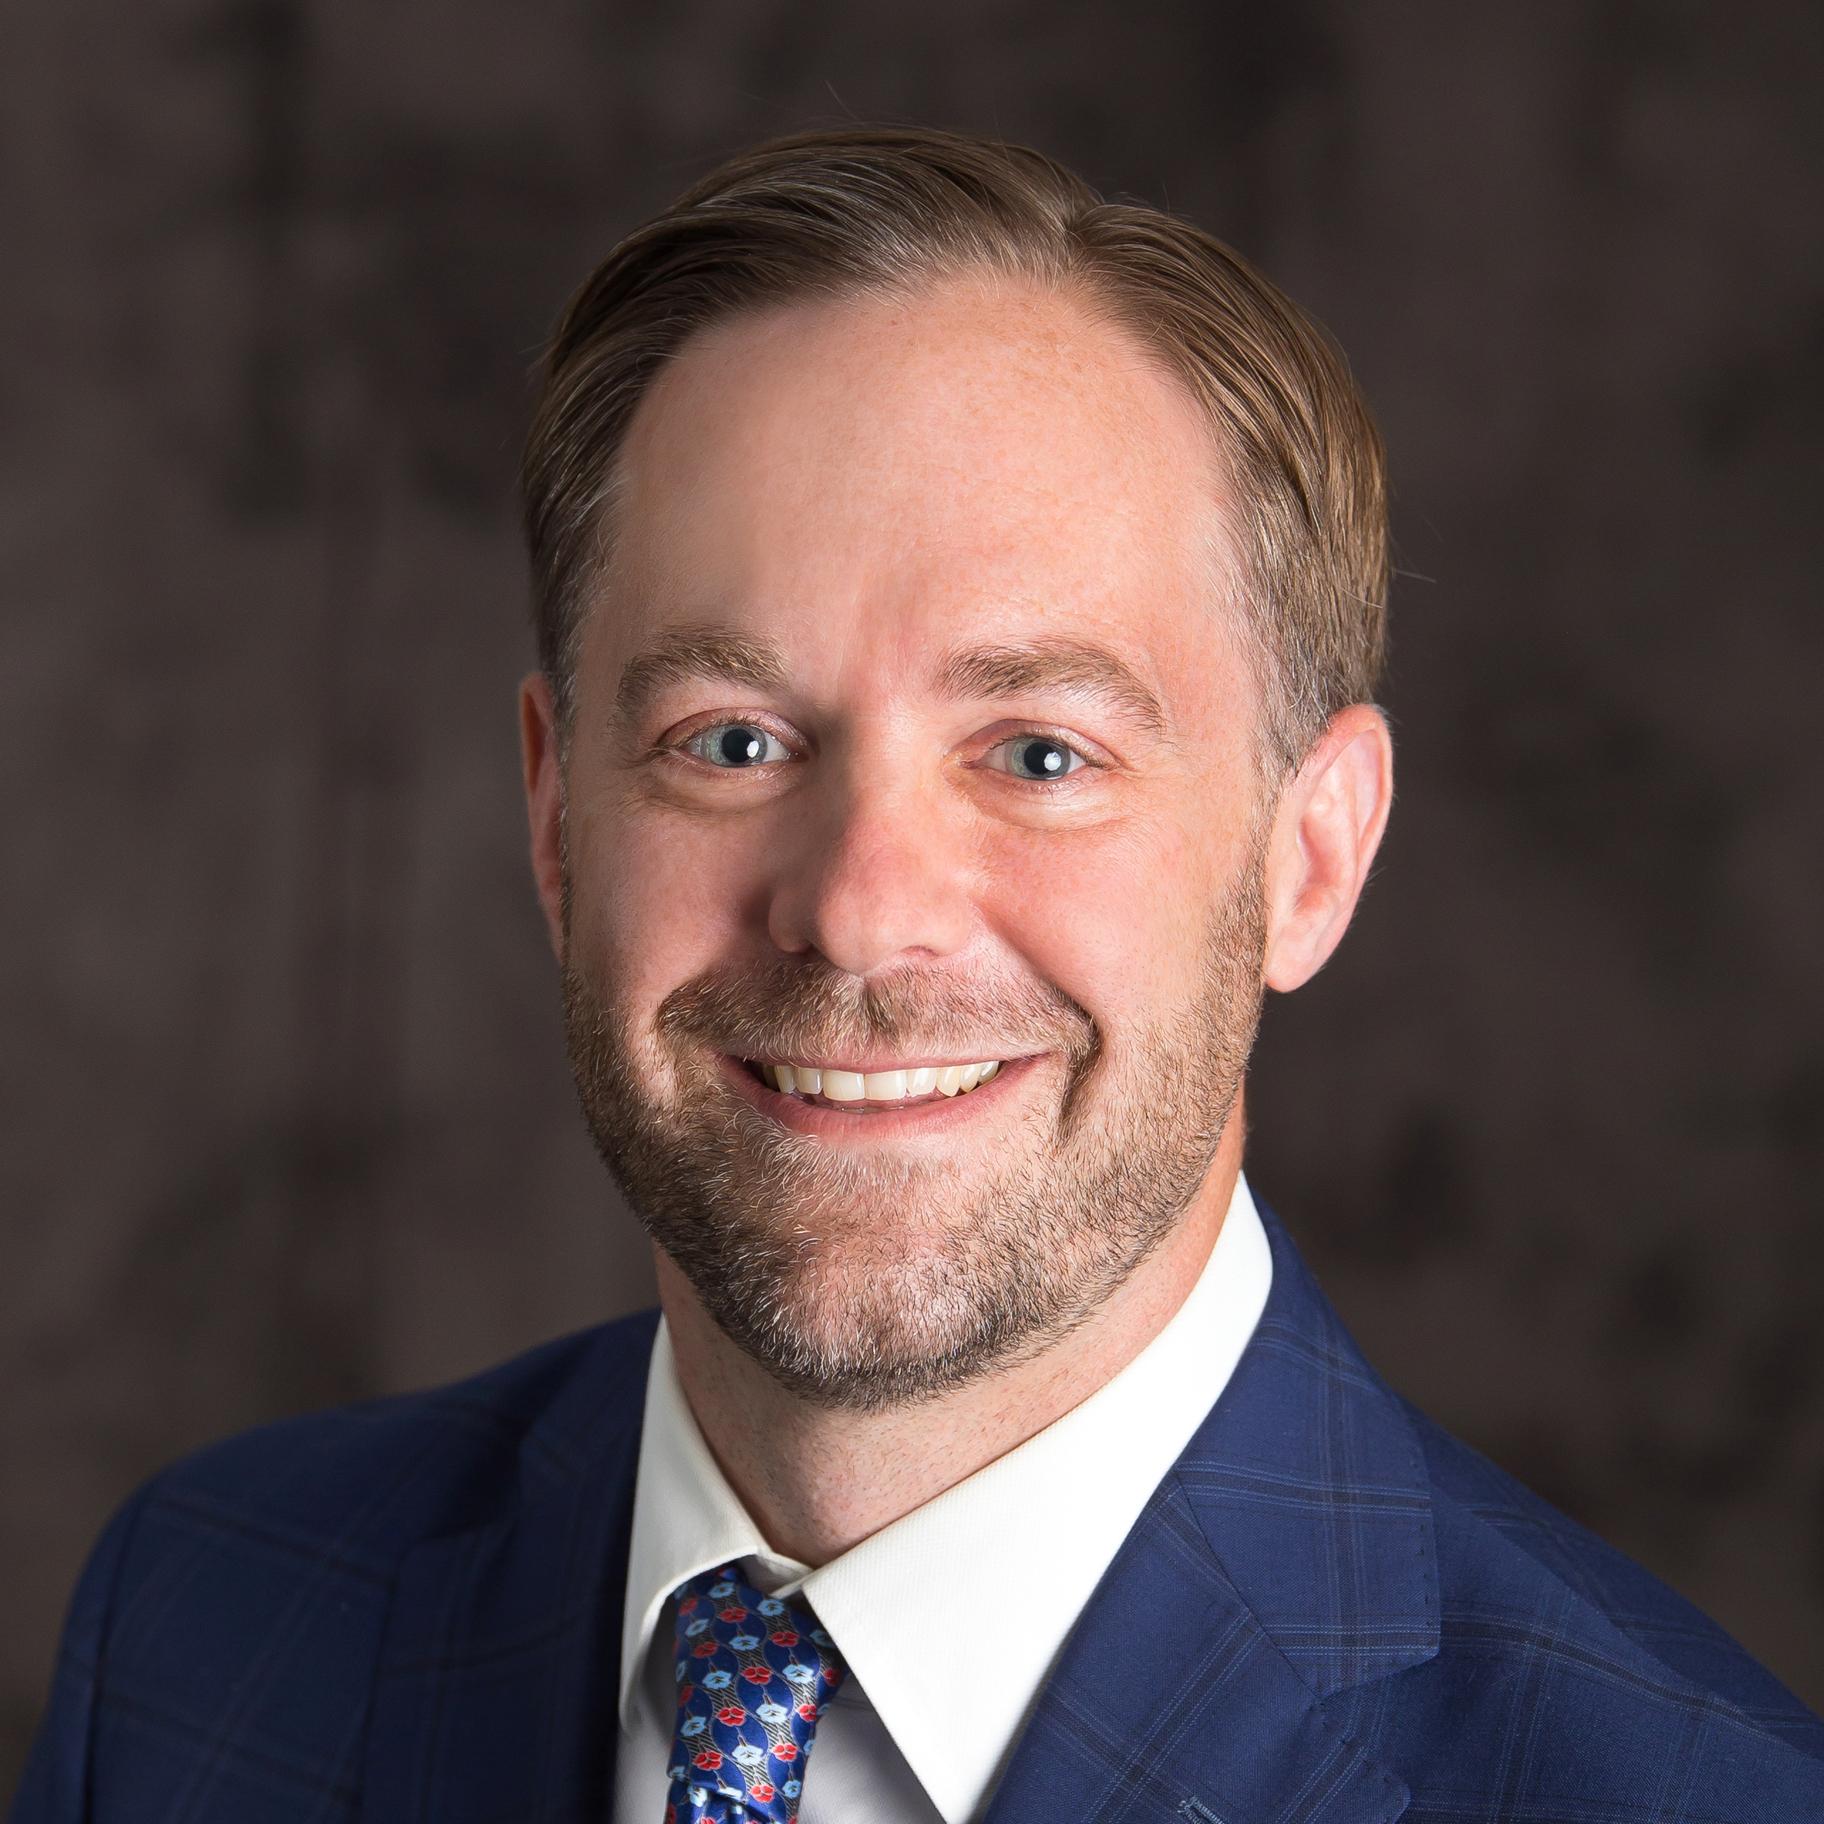 Matthew Isakson - Partner at Meridian Compensation Partners, LLC